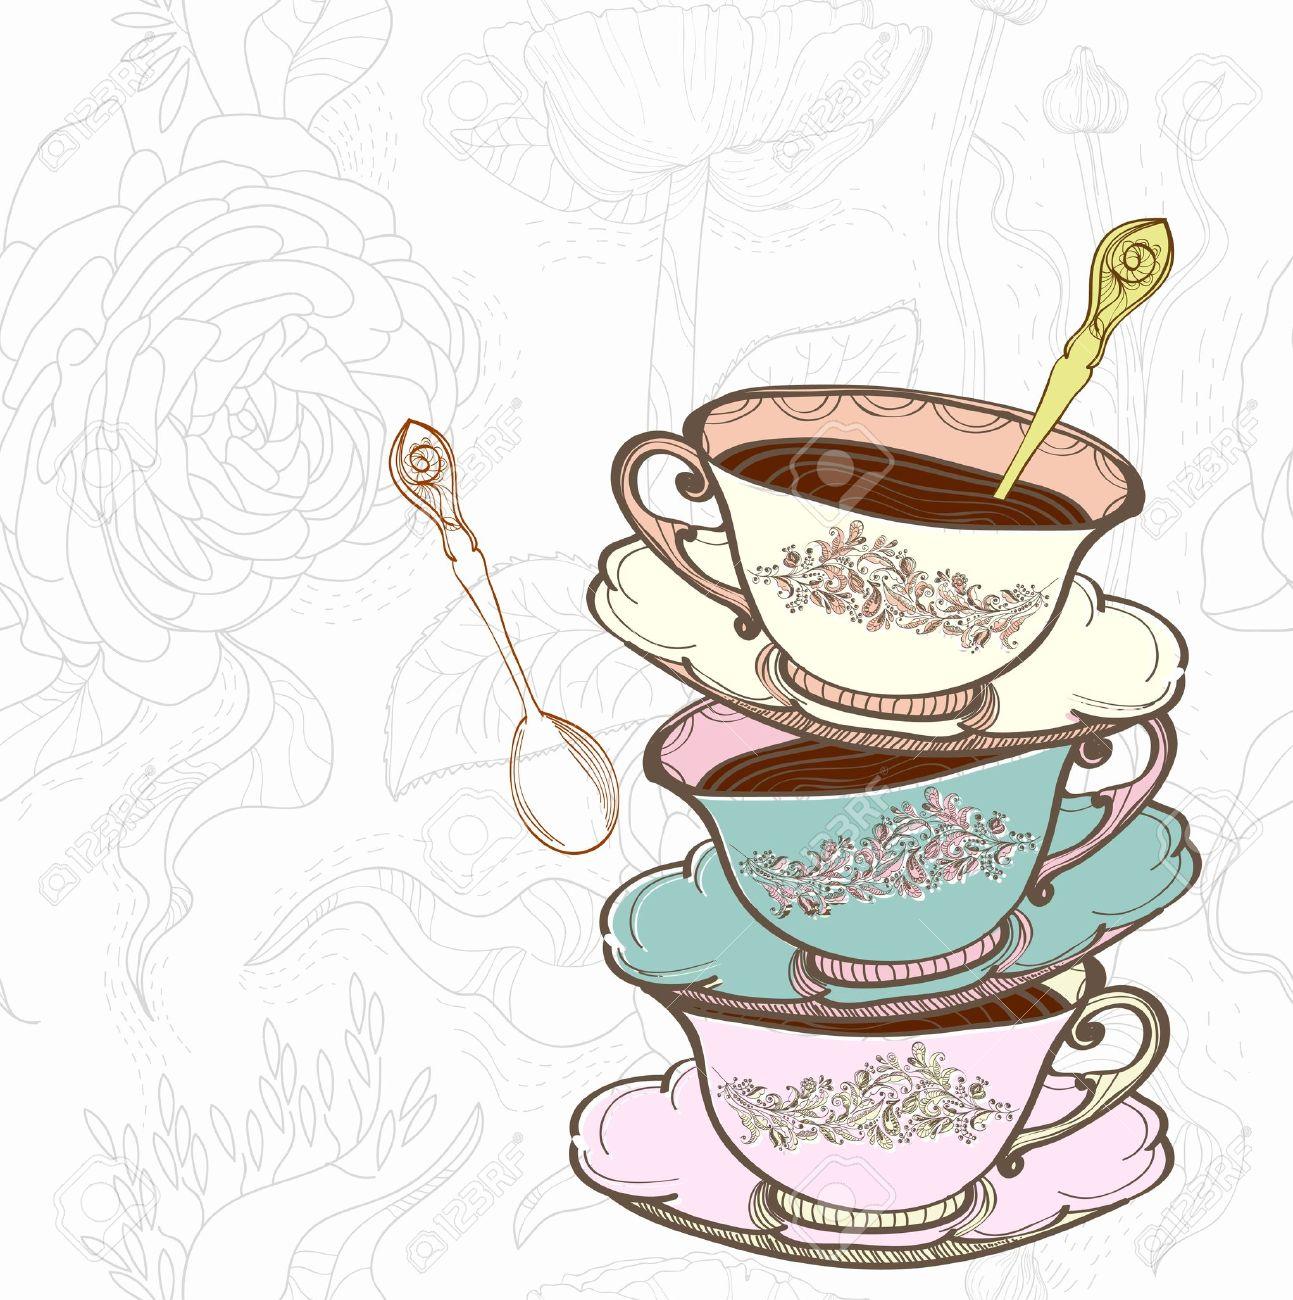 Elegant tea party invitation template with teacups cartoon vector - Tea Cup Tea Cup Background With Spoon Illustration